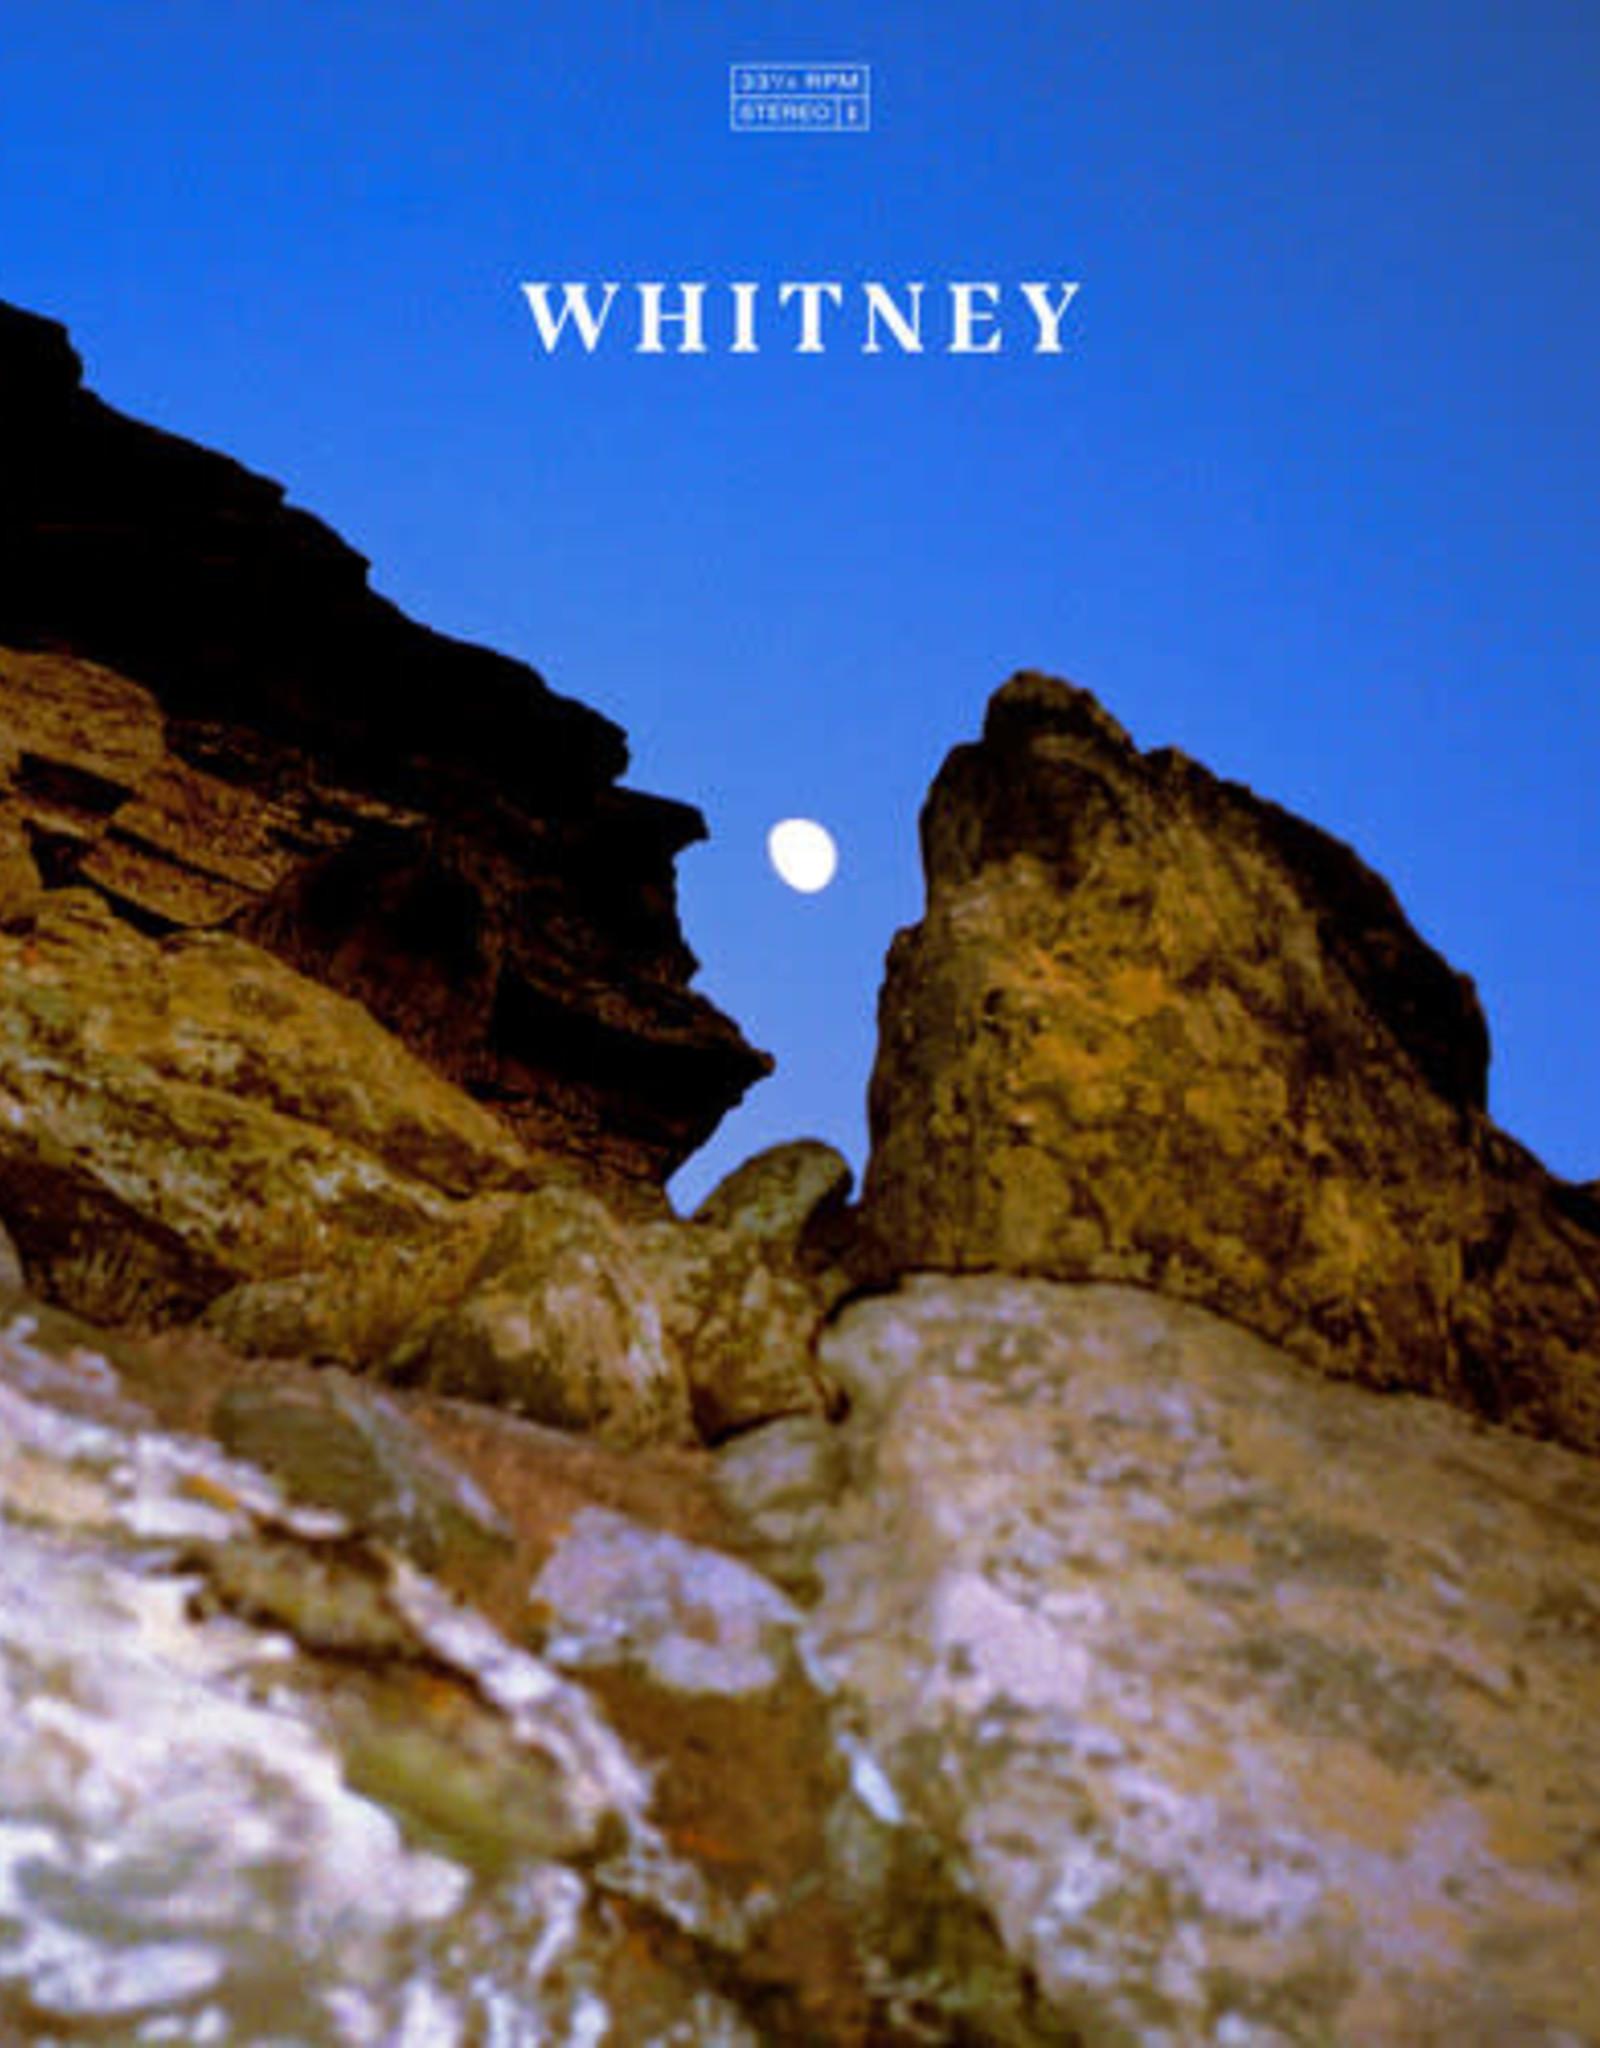 Whitney / Candid